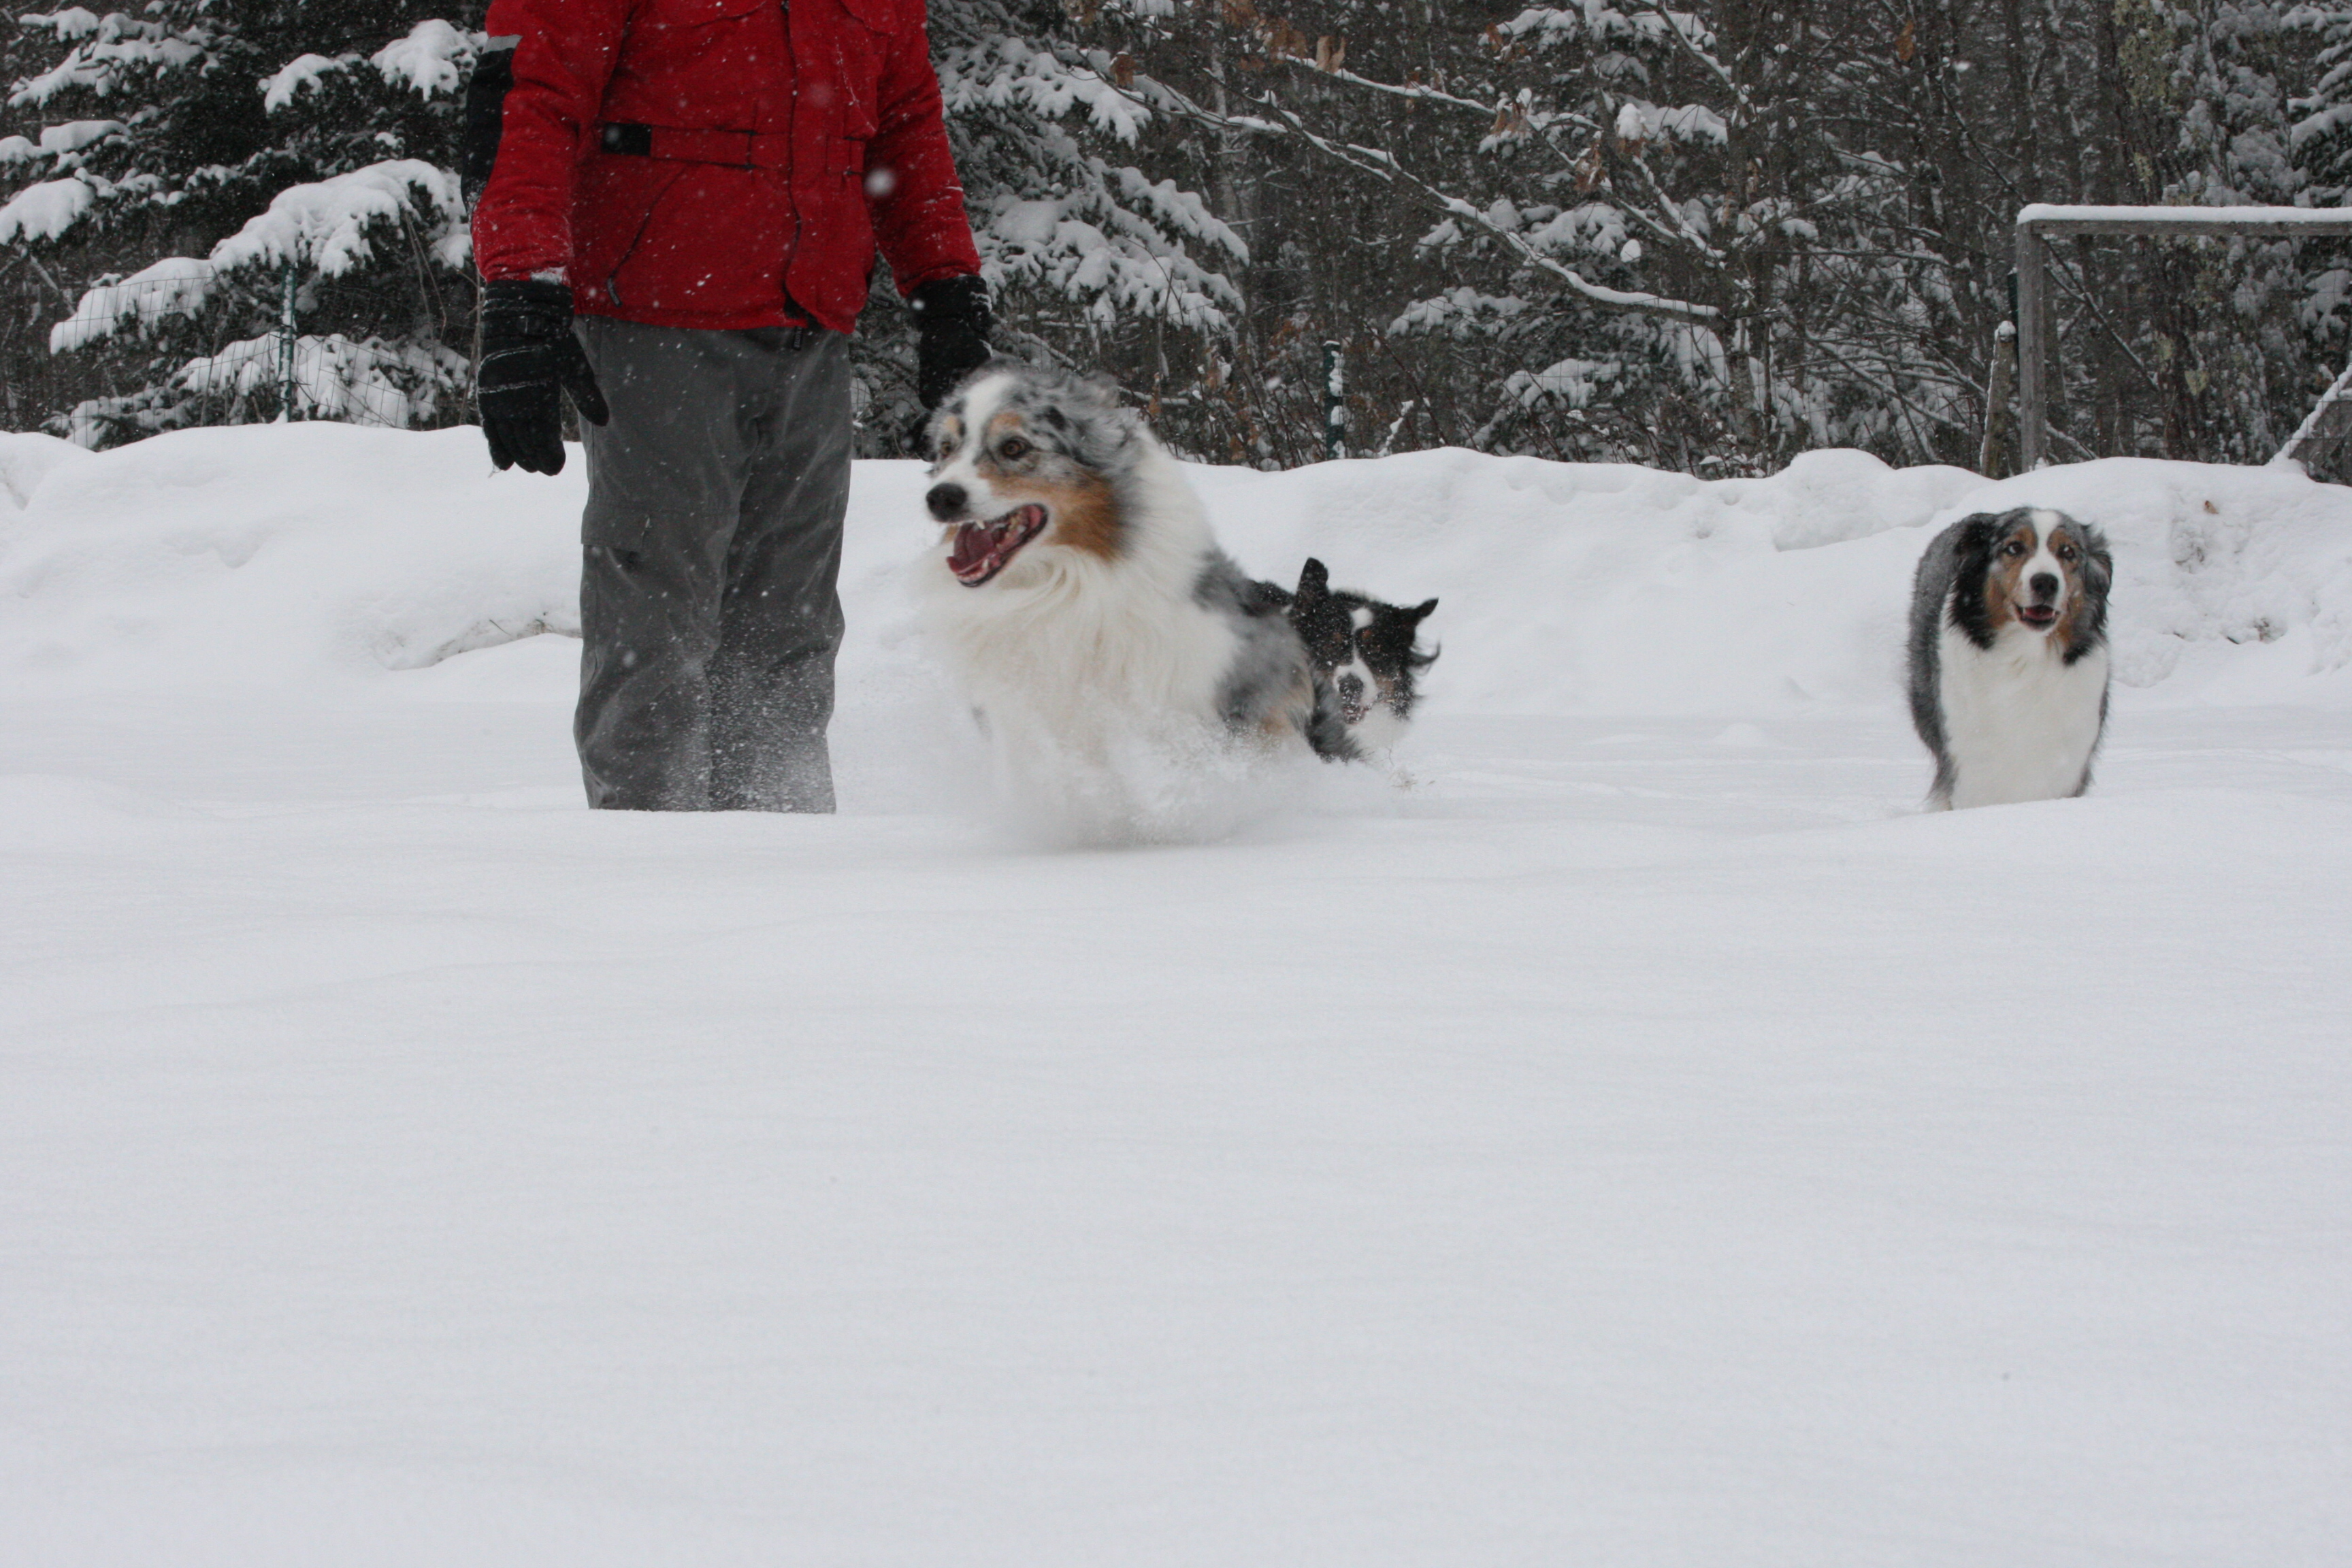 Dogs Feb 11, 2017 (7)